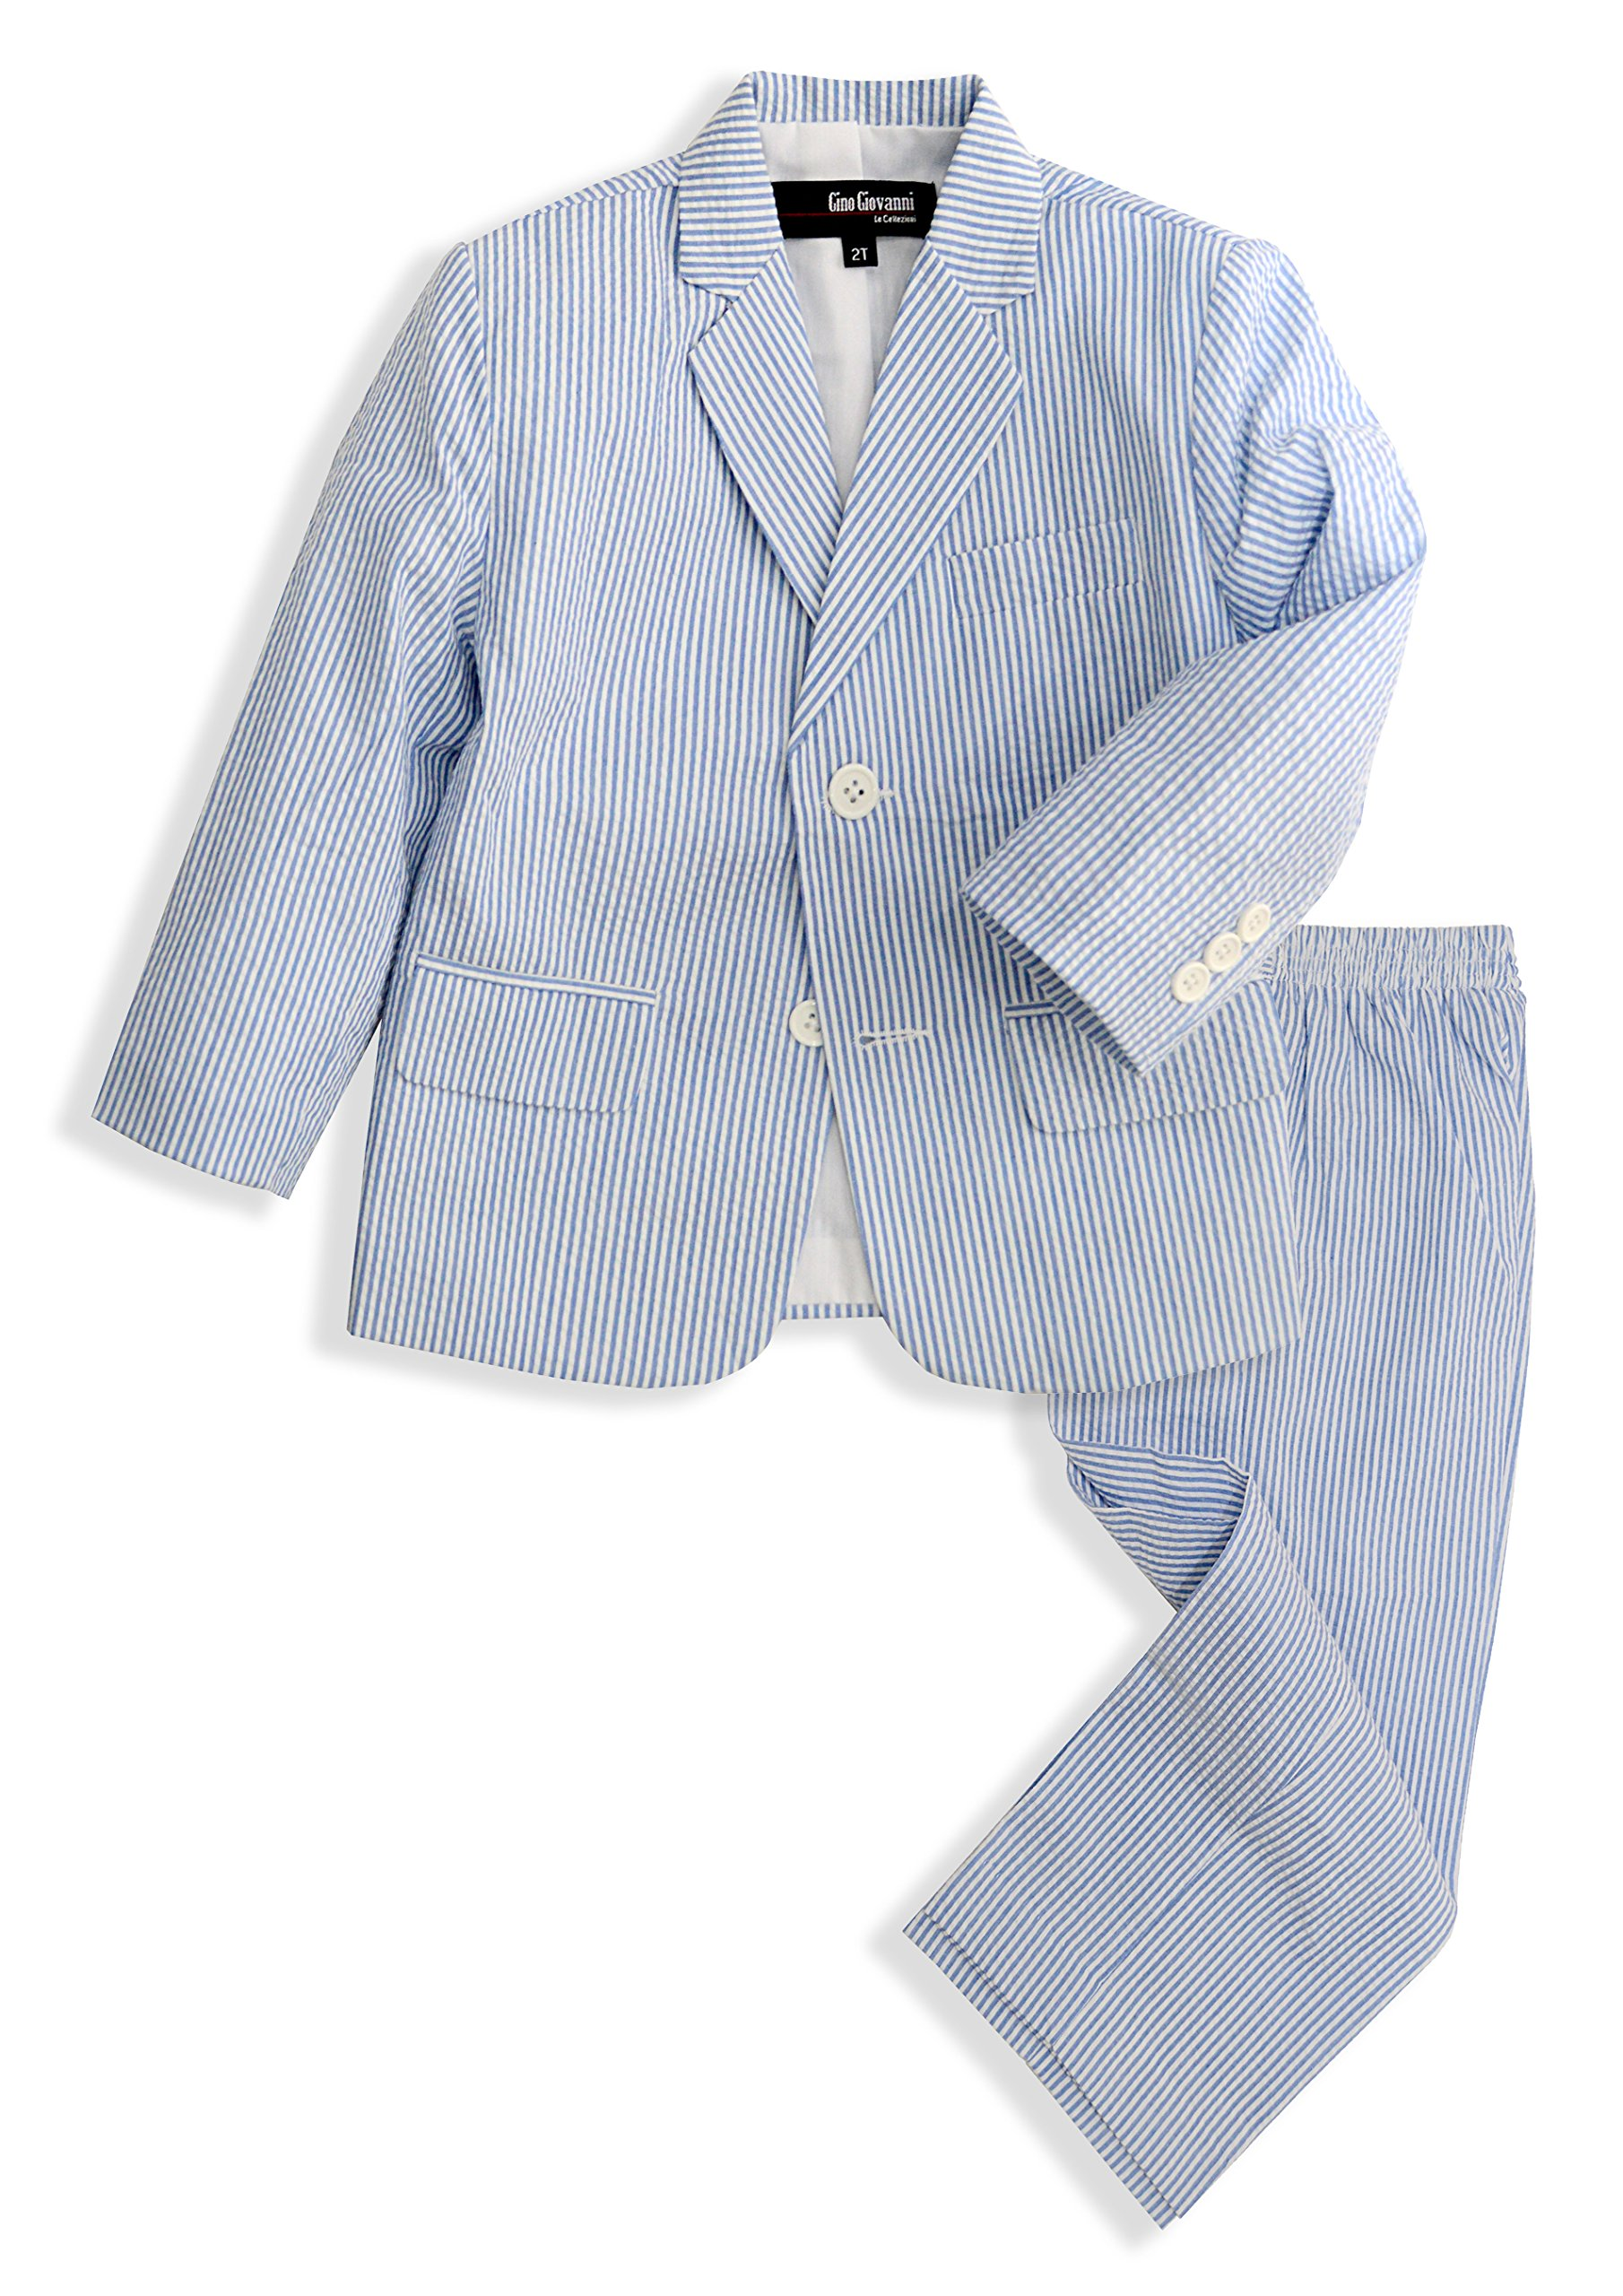 G288 Boys Seersucker 2 Button Suit Set (12, Blue)